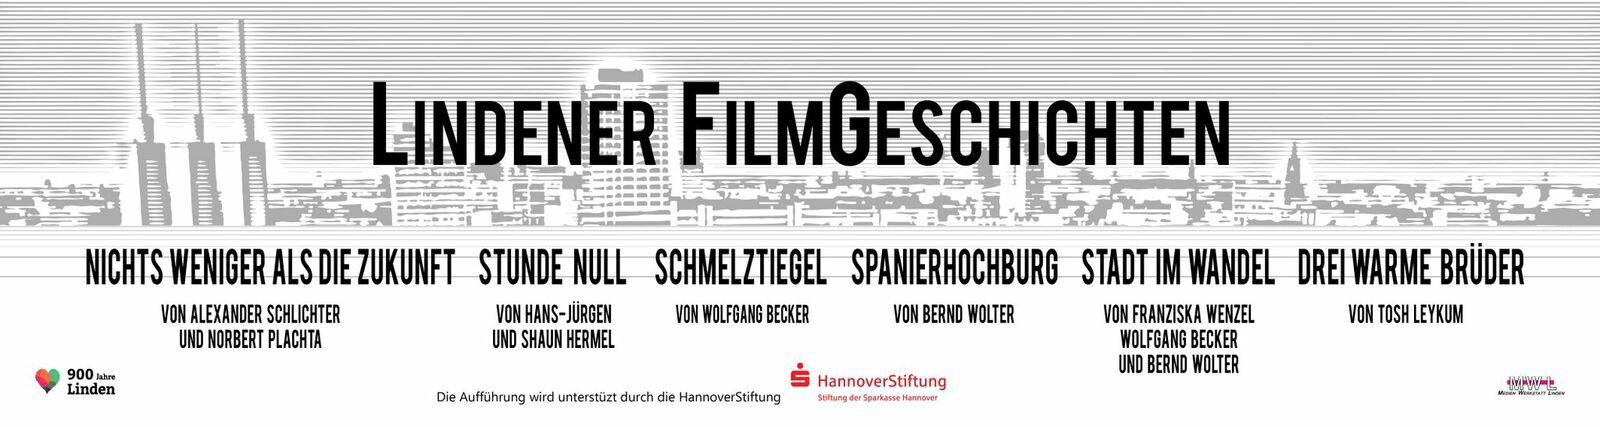 LindenerFilmgeschichten_Banner